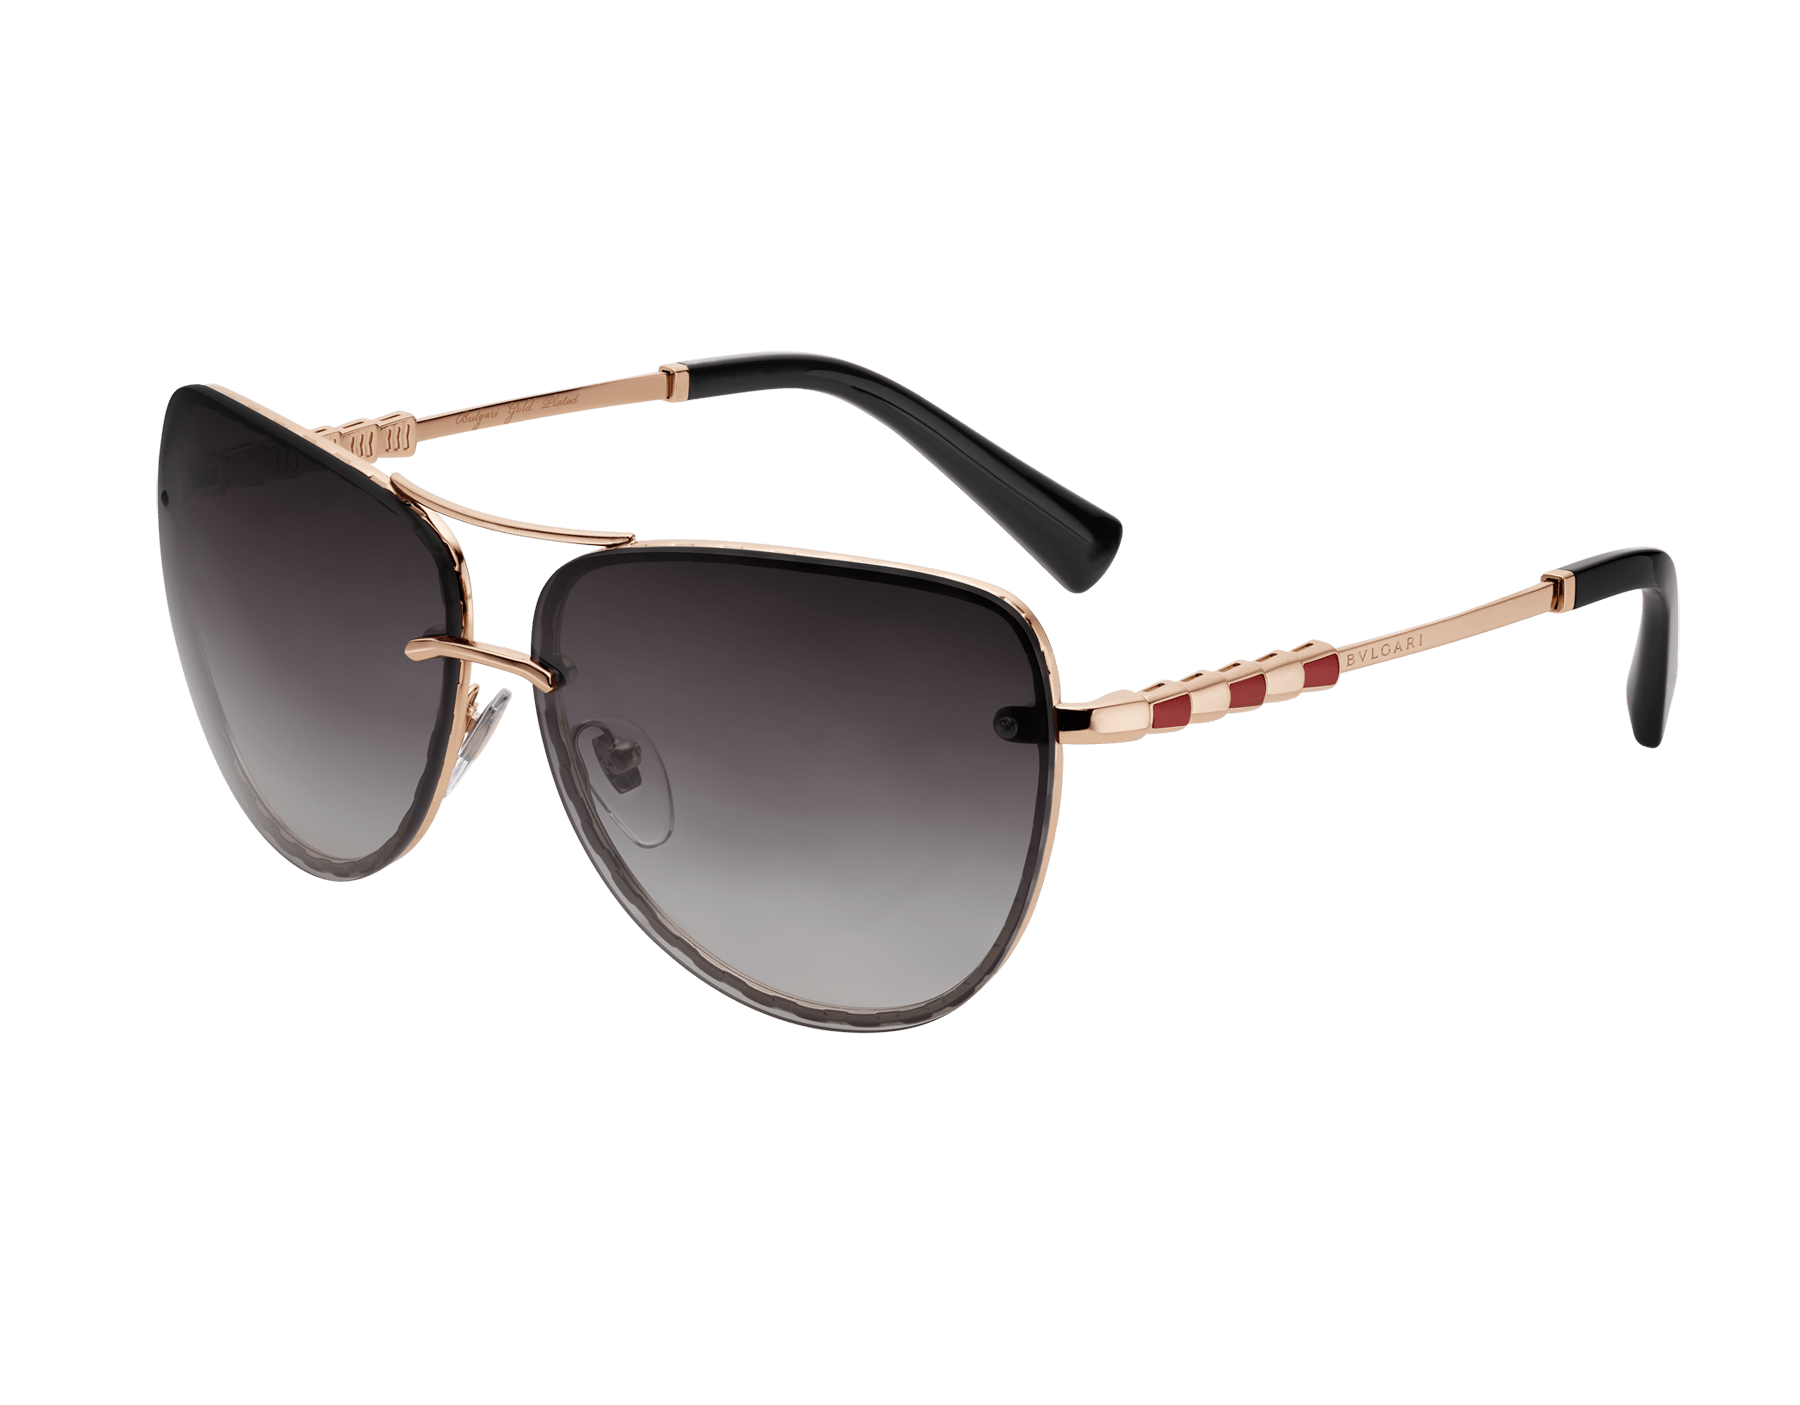 Bvlgari Serpenti Pilot gold plated metal sunglasses with gemstones and polar lenses. 903683 image 1